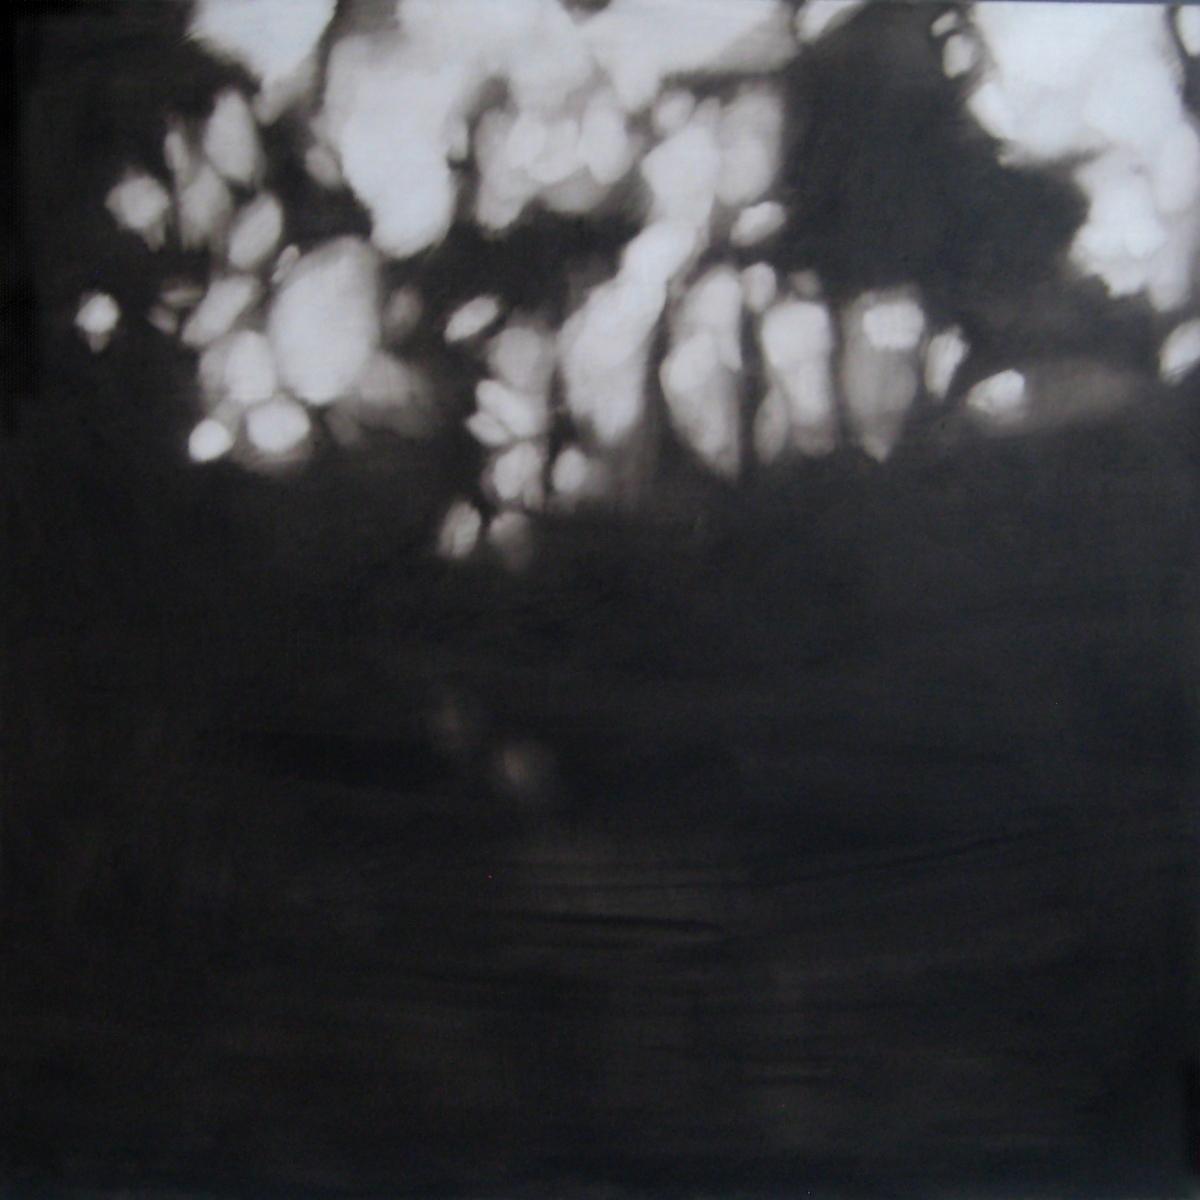 Vastavaloon I, öljy ja pigmentti levylle, 97 x 97 cm, 2017